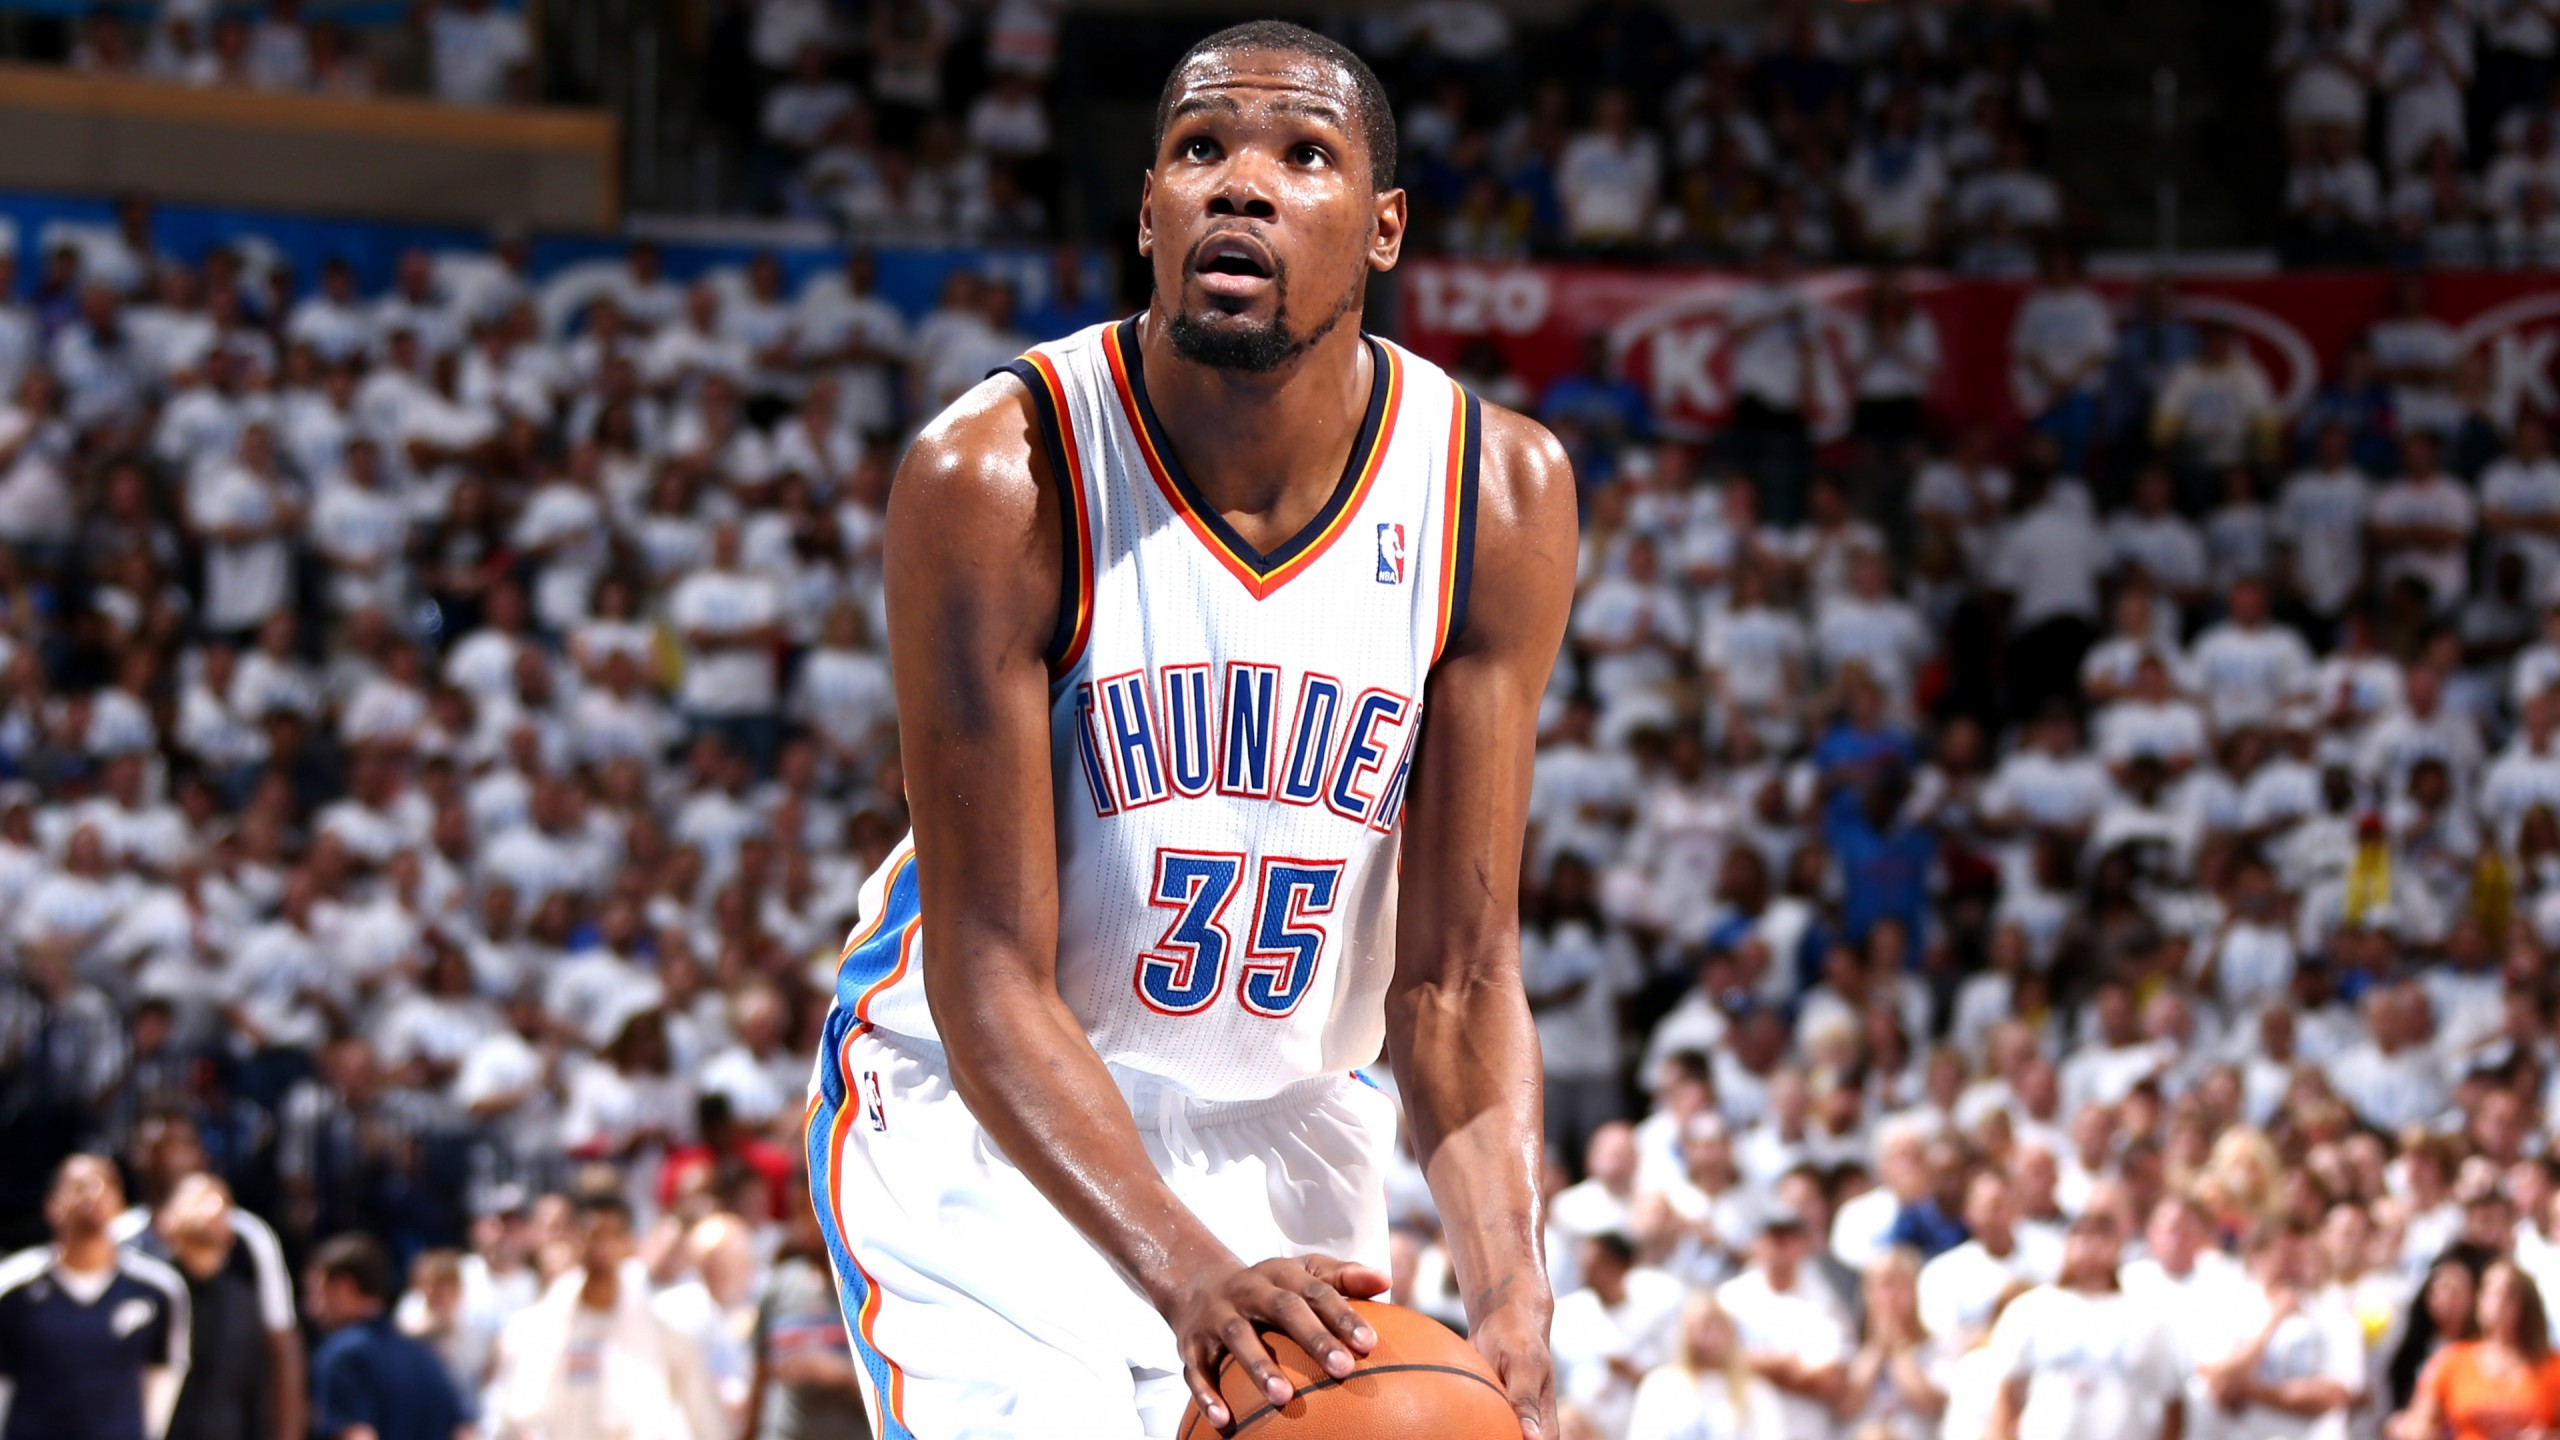 Wallpaper Kevin Durant Golden State Warriors Basketball NBA 4K